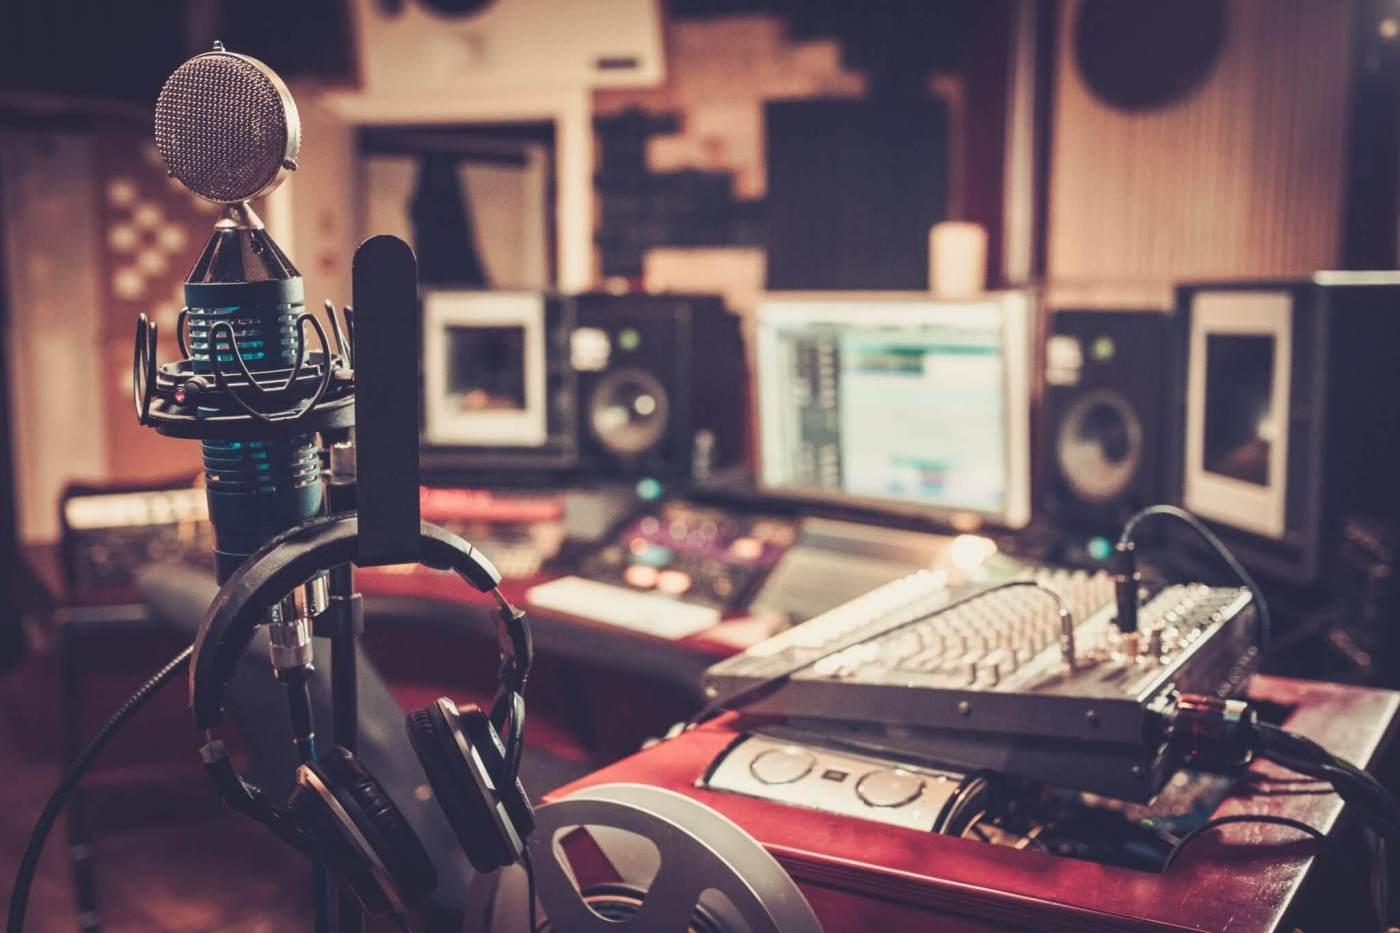 radio facts,radio djs,urban adult,Urban Radio,urban radio personalities, rap radio stations,r&b radio station, hip hop radio, black female singers